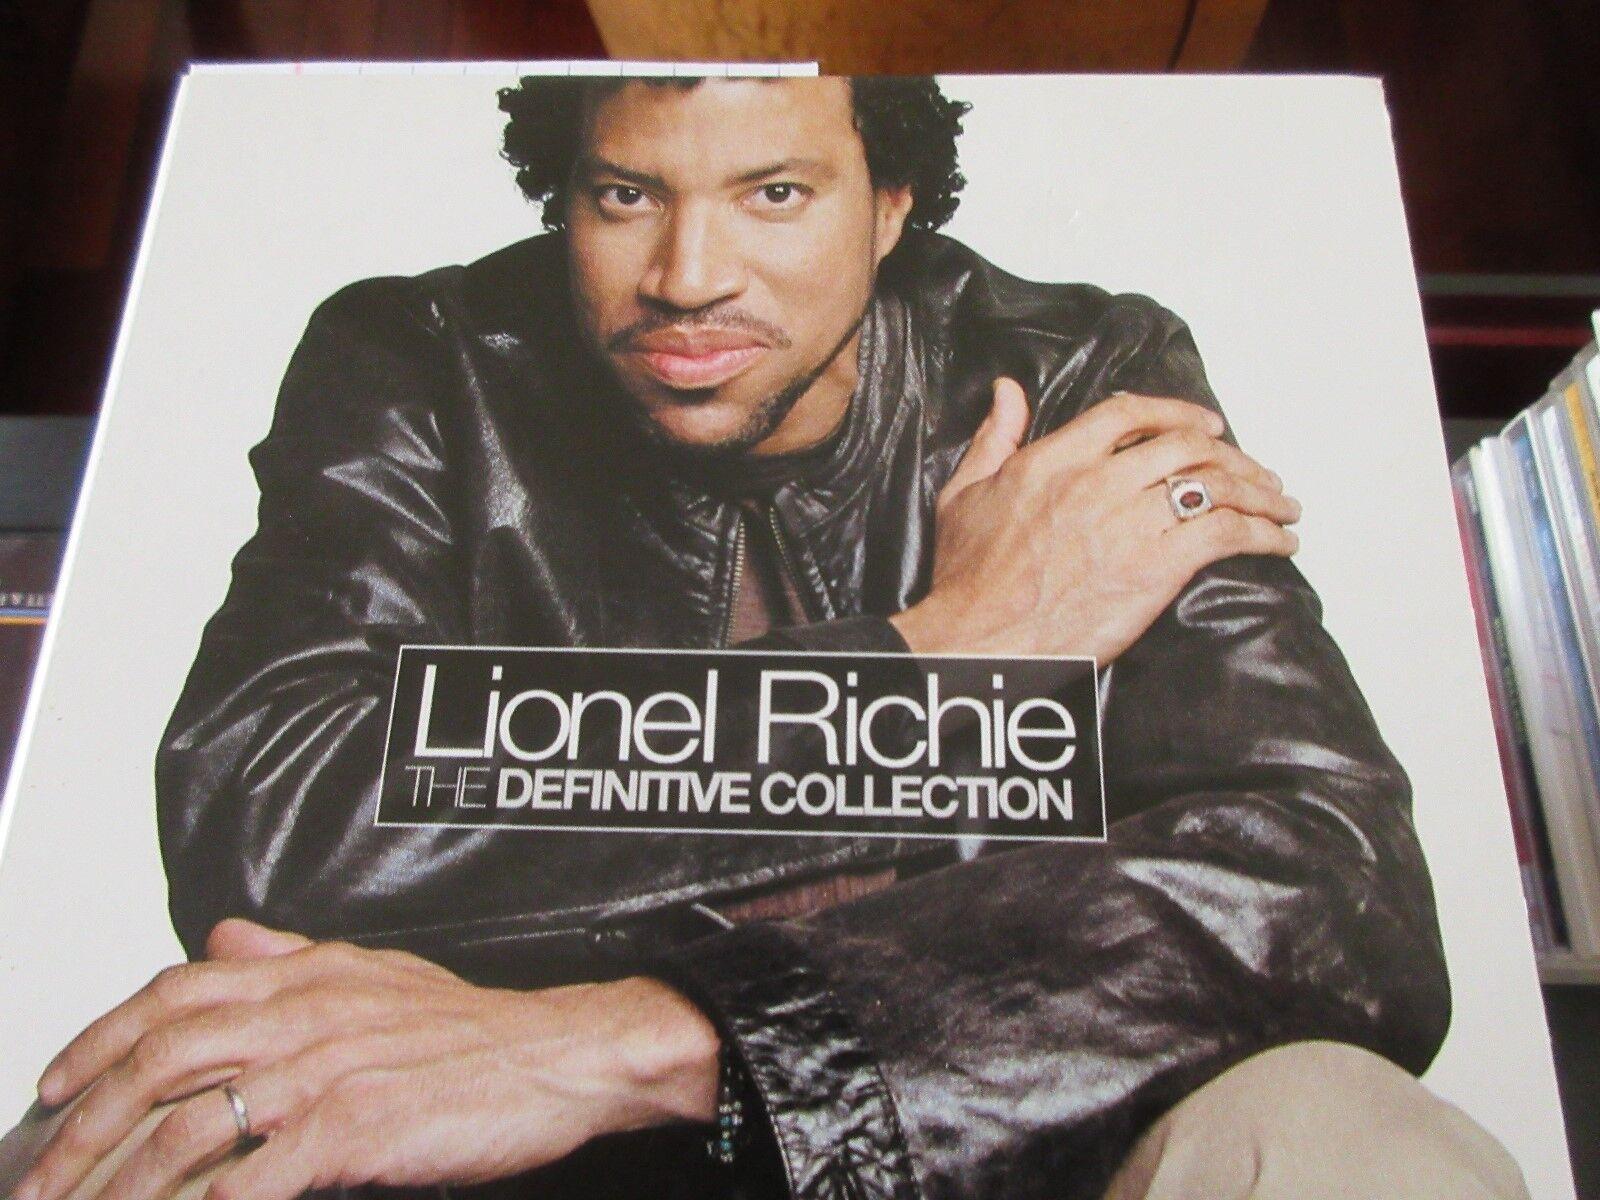 Lionel Richie , Definitive Collection , CD 44006881522